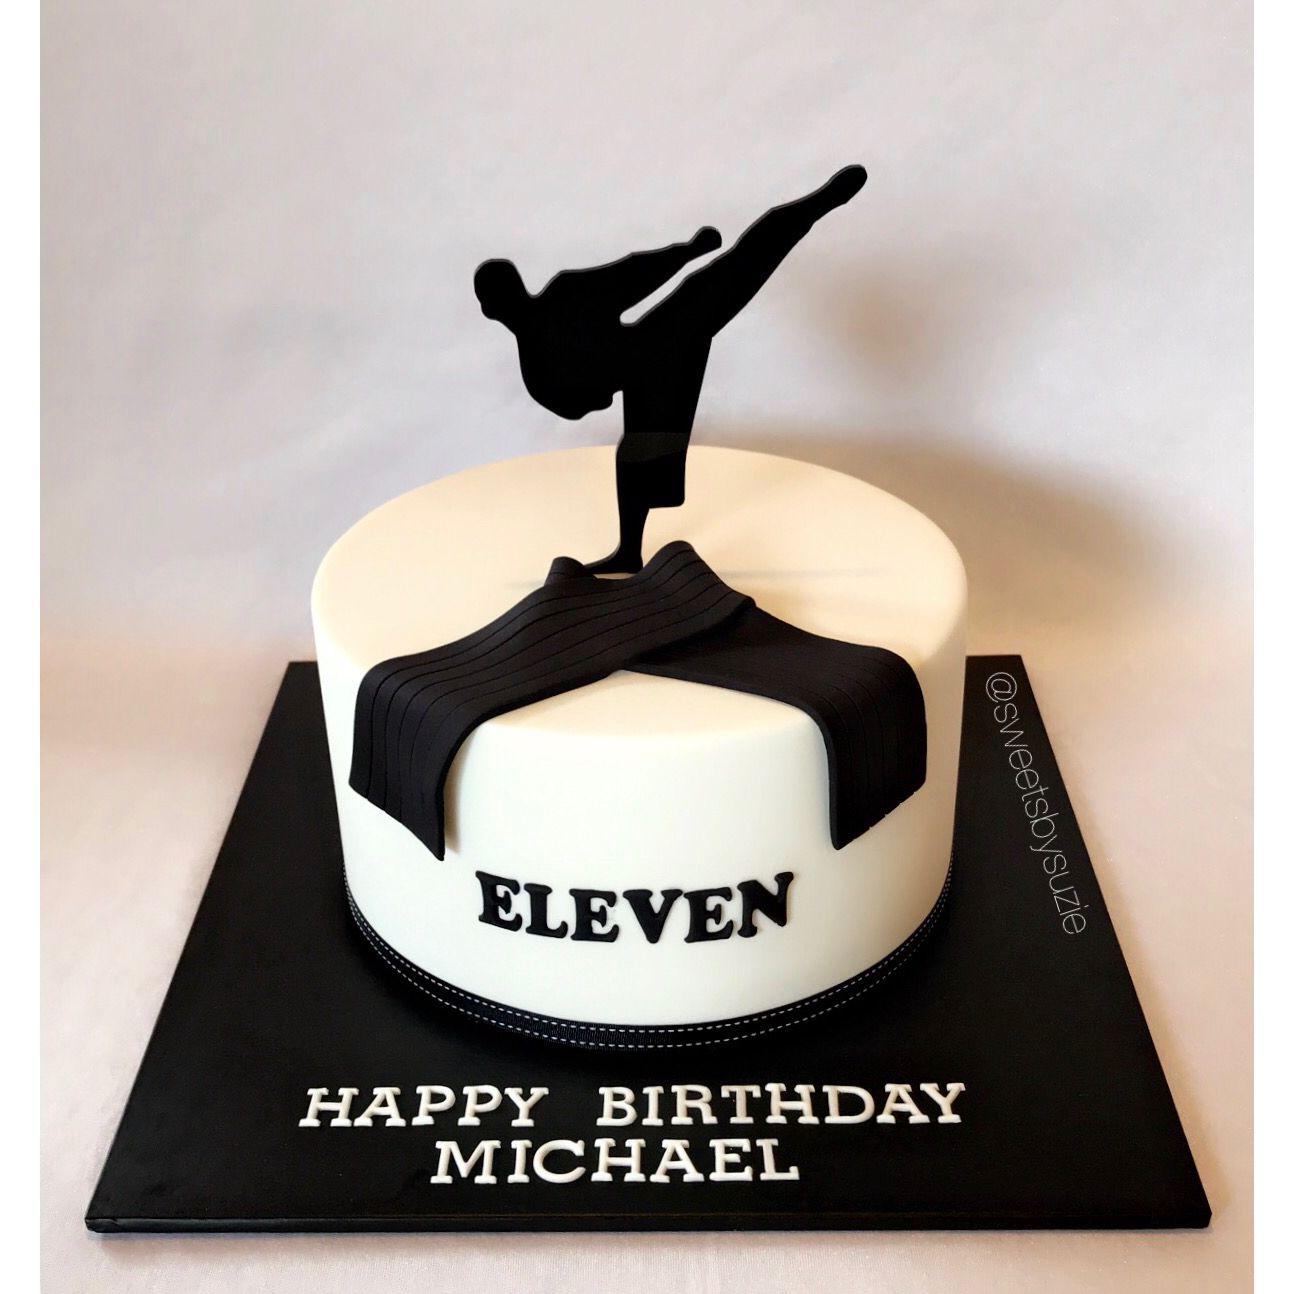 Karate Black Belt Birthday Cake Made By Sweetsbysuzie In Melbourne